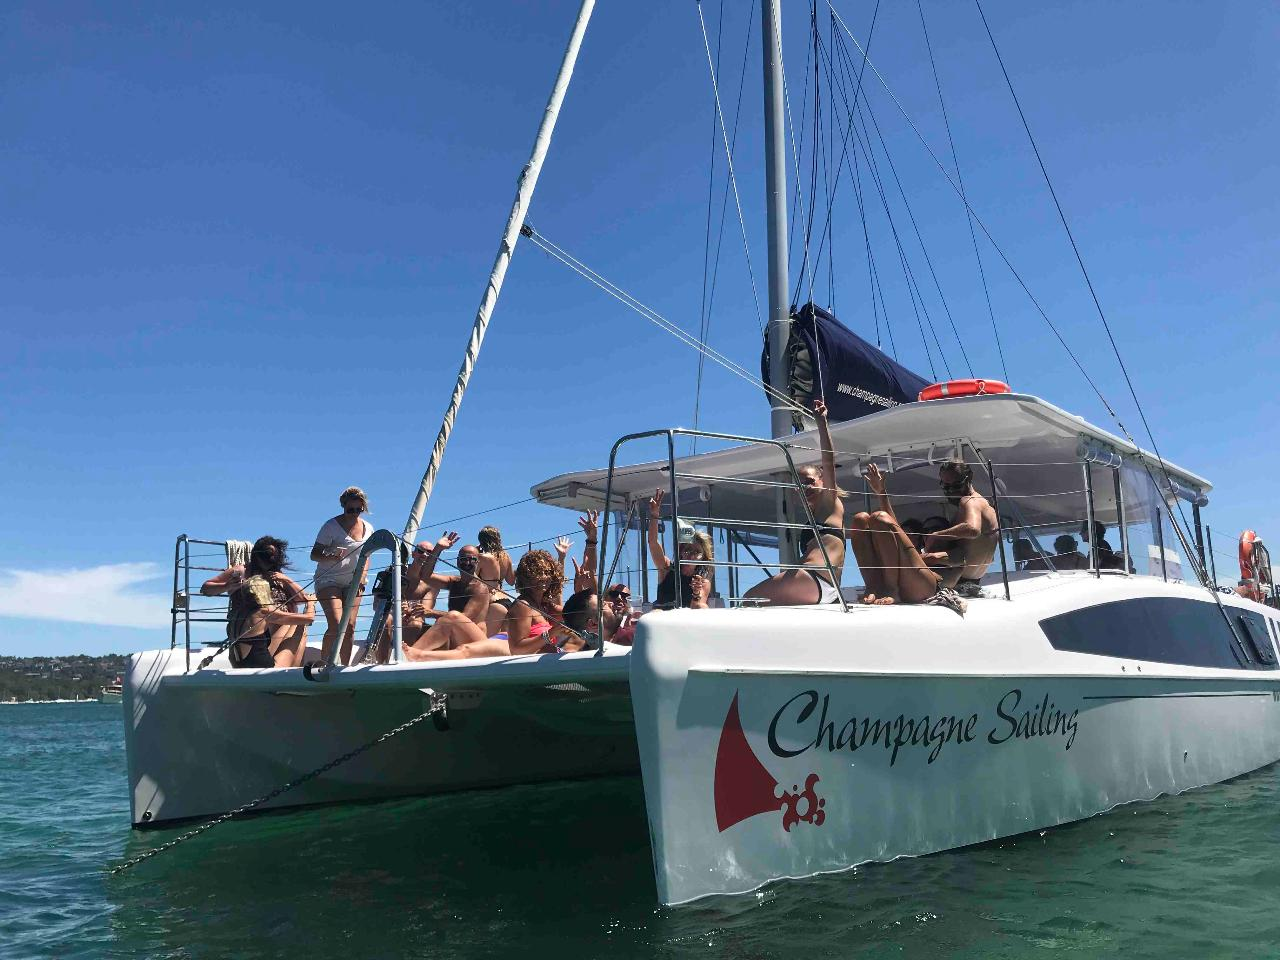 CHAMPAGNE SAILING Catamaran Hire for 31 – 43 guests (COVID Capacity max 22 people)